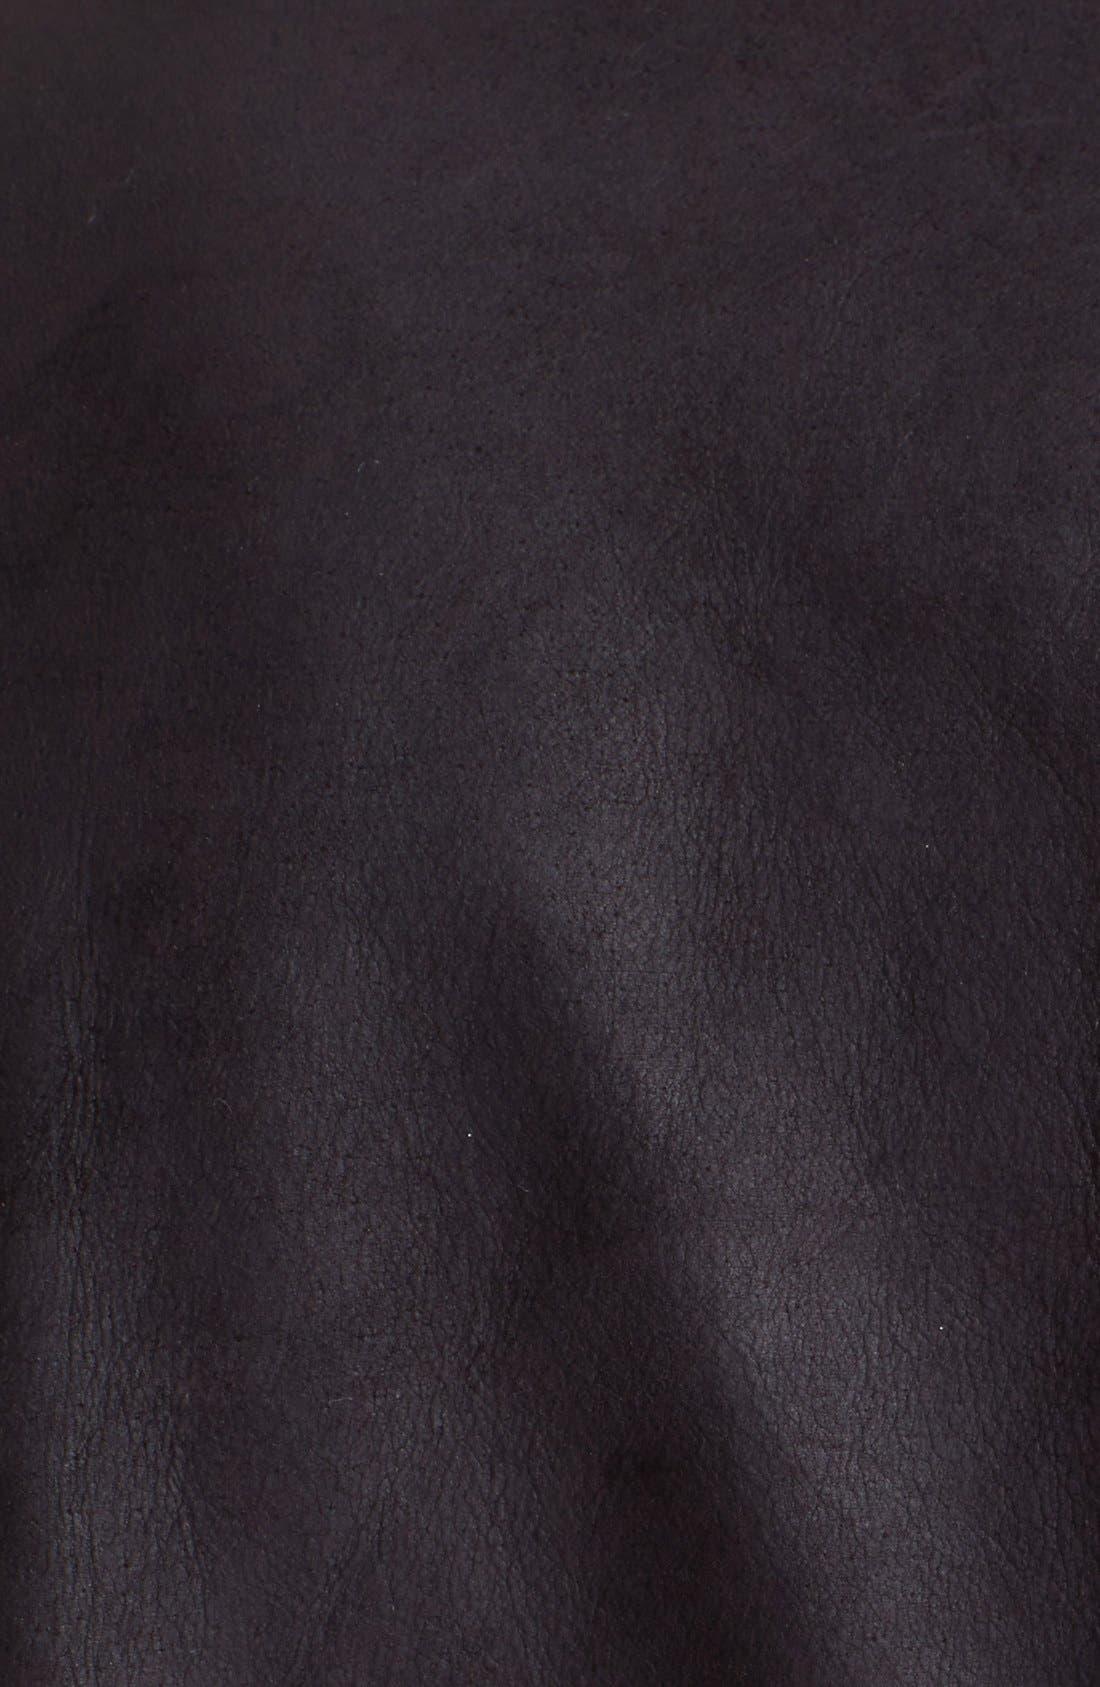 Alternate Image 3  - Michael Kors 'Lodi' Jacket